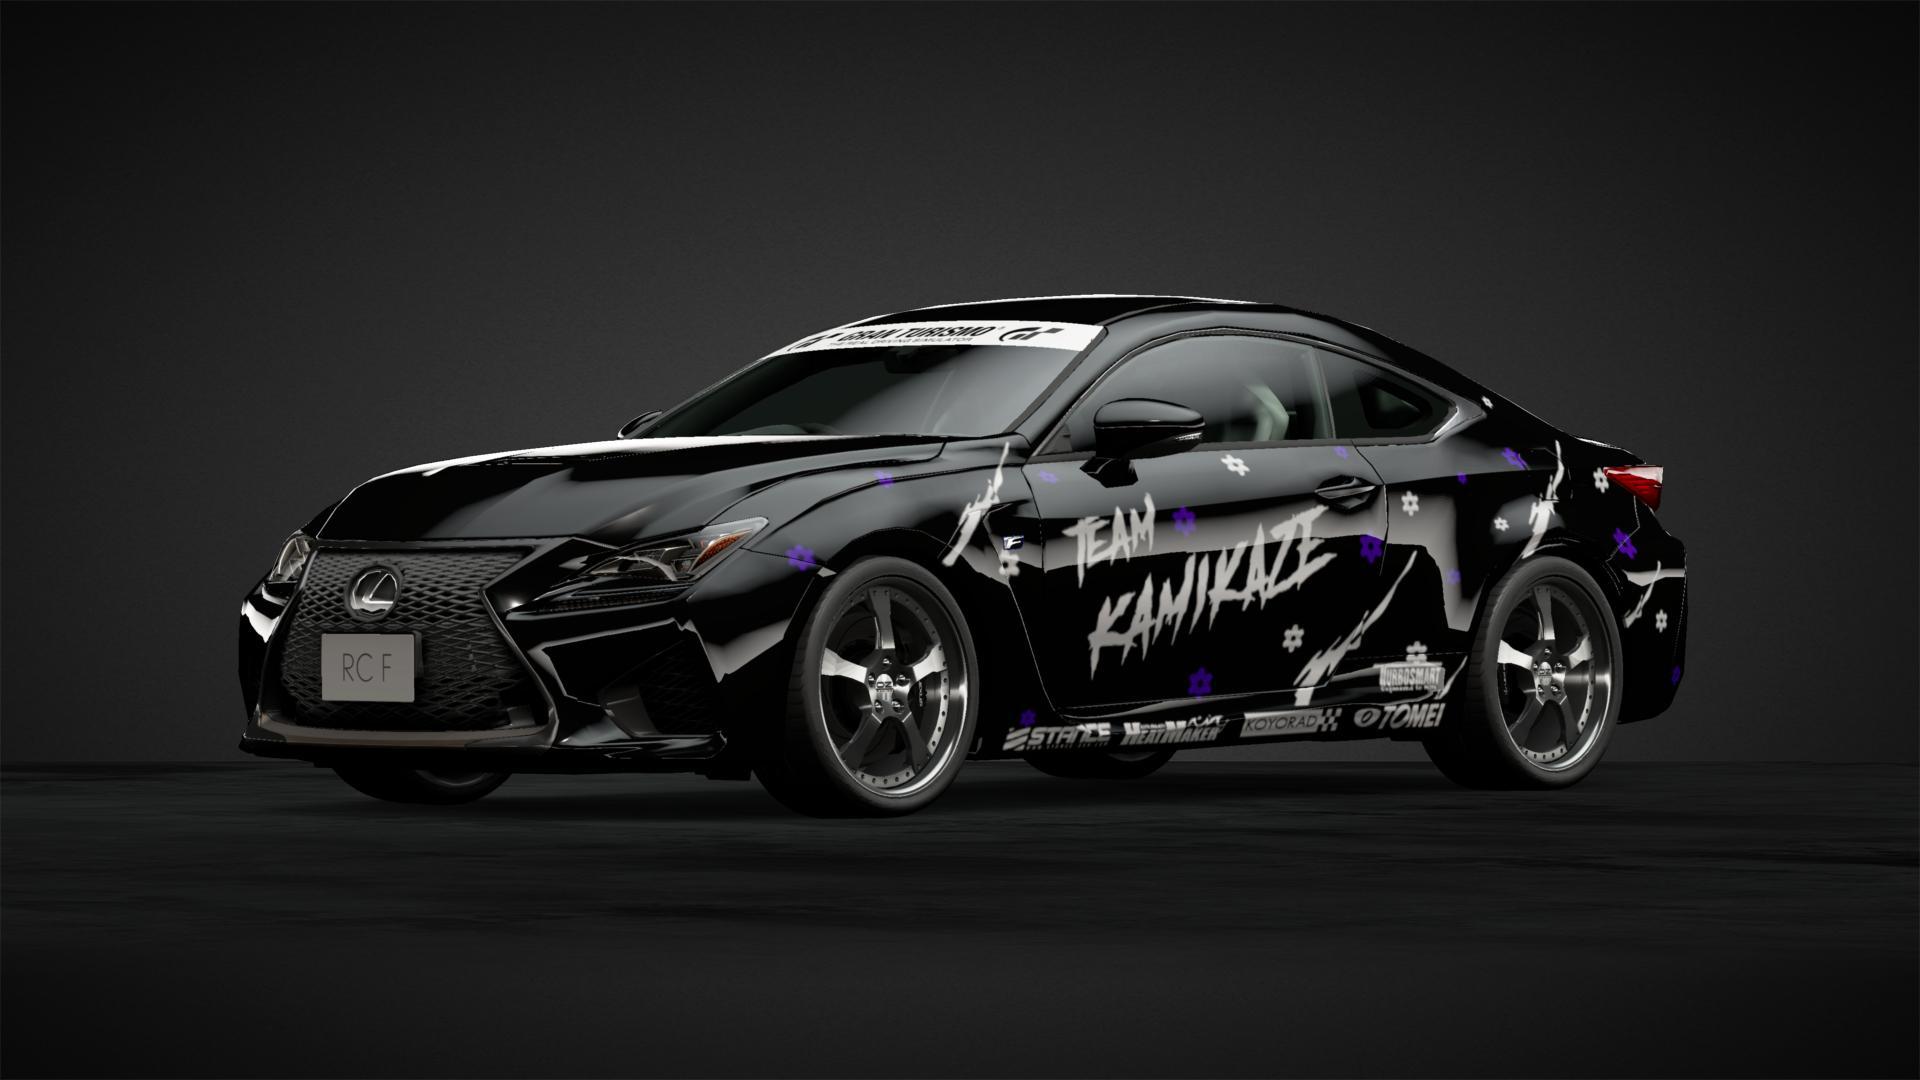 Team Kamikaze Car Livery By Aao Maty Community Gran Turismo